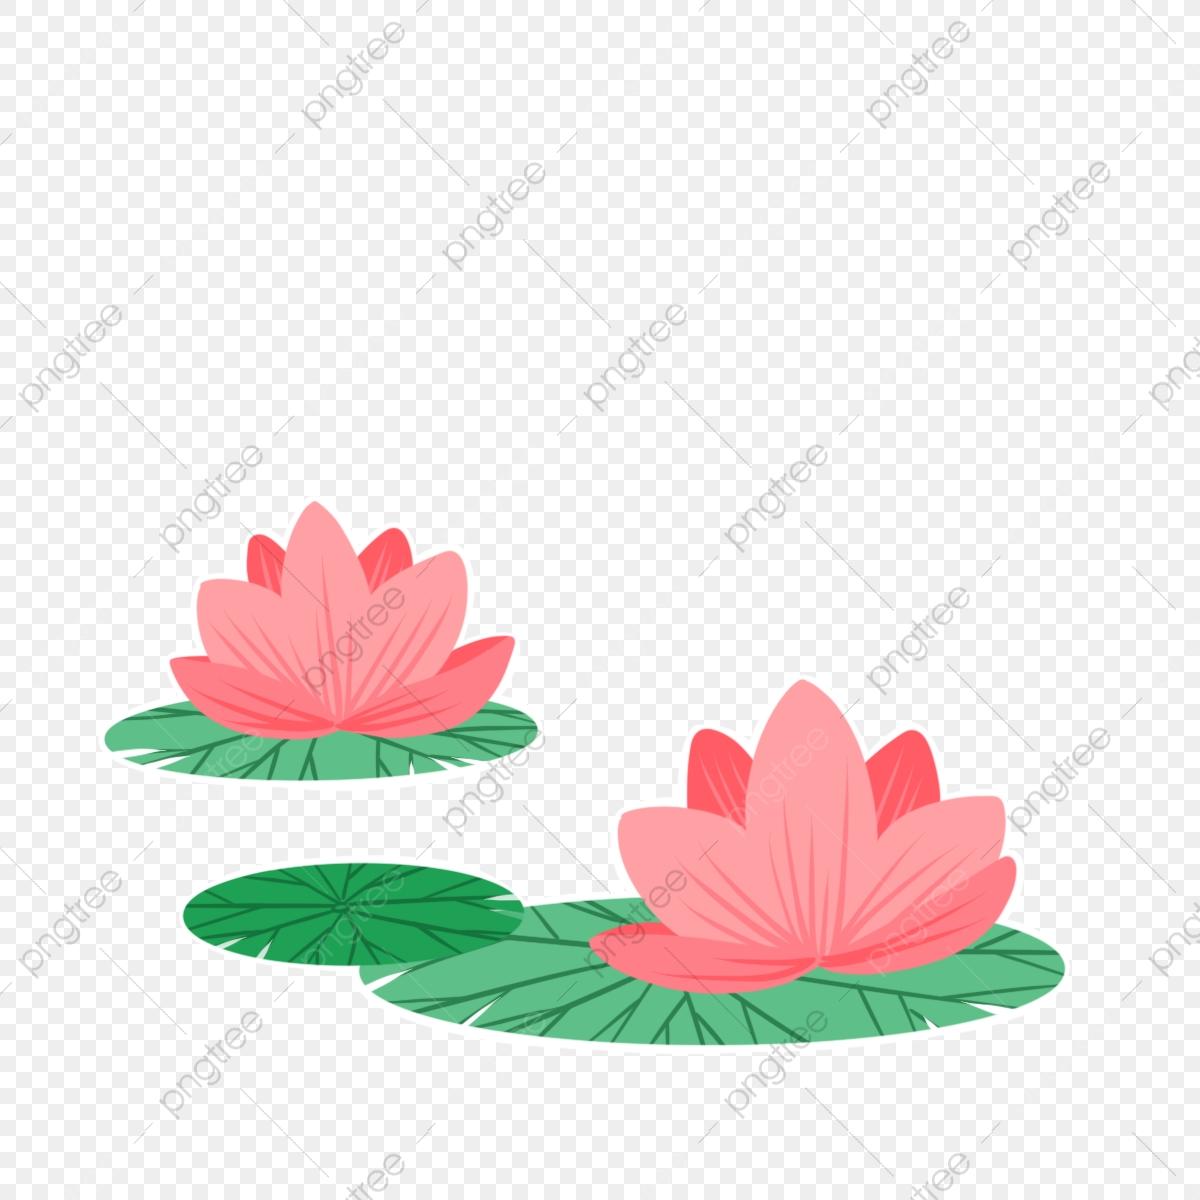 Hand drawn spring plants. Lotus clipart cute